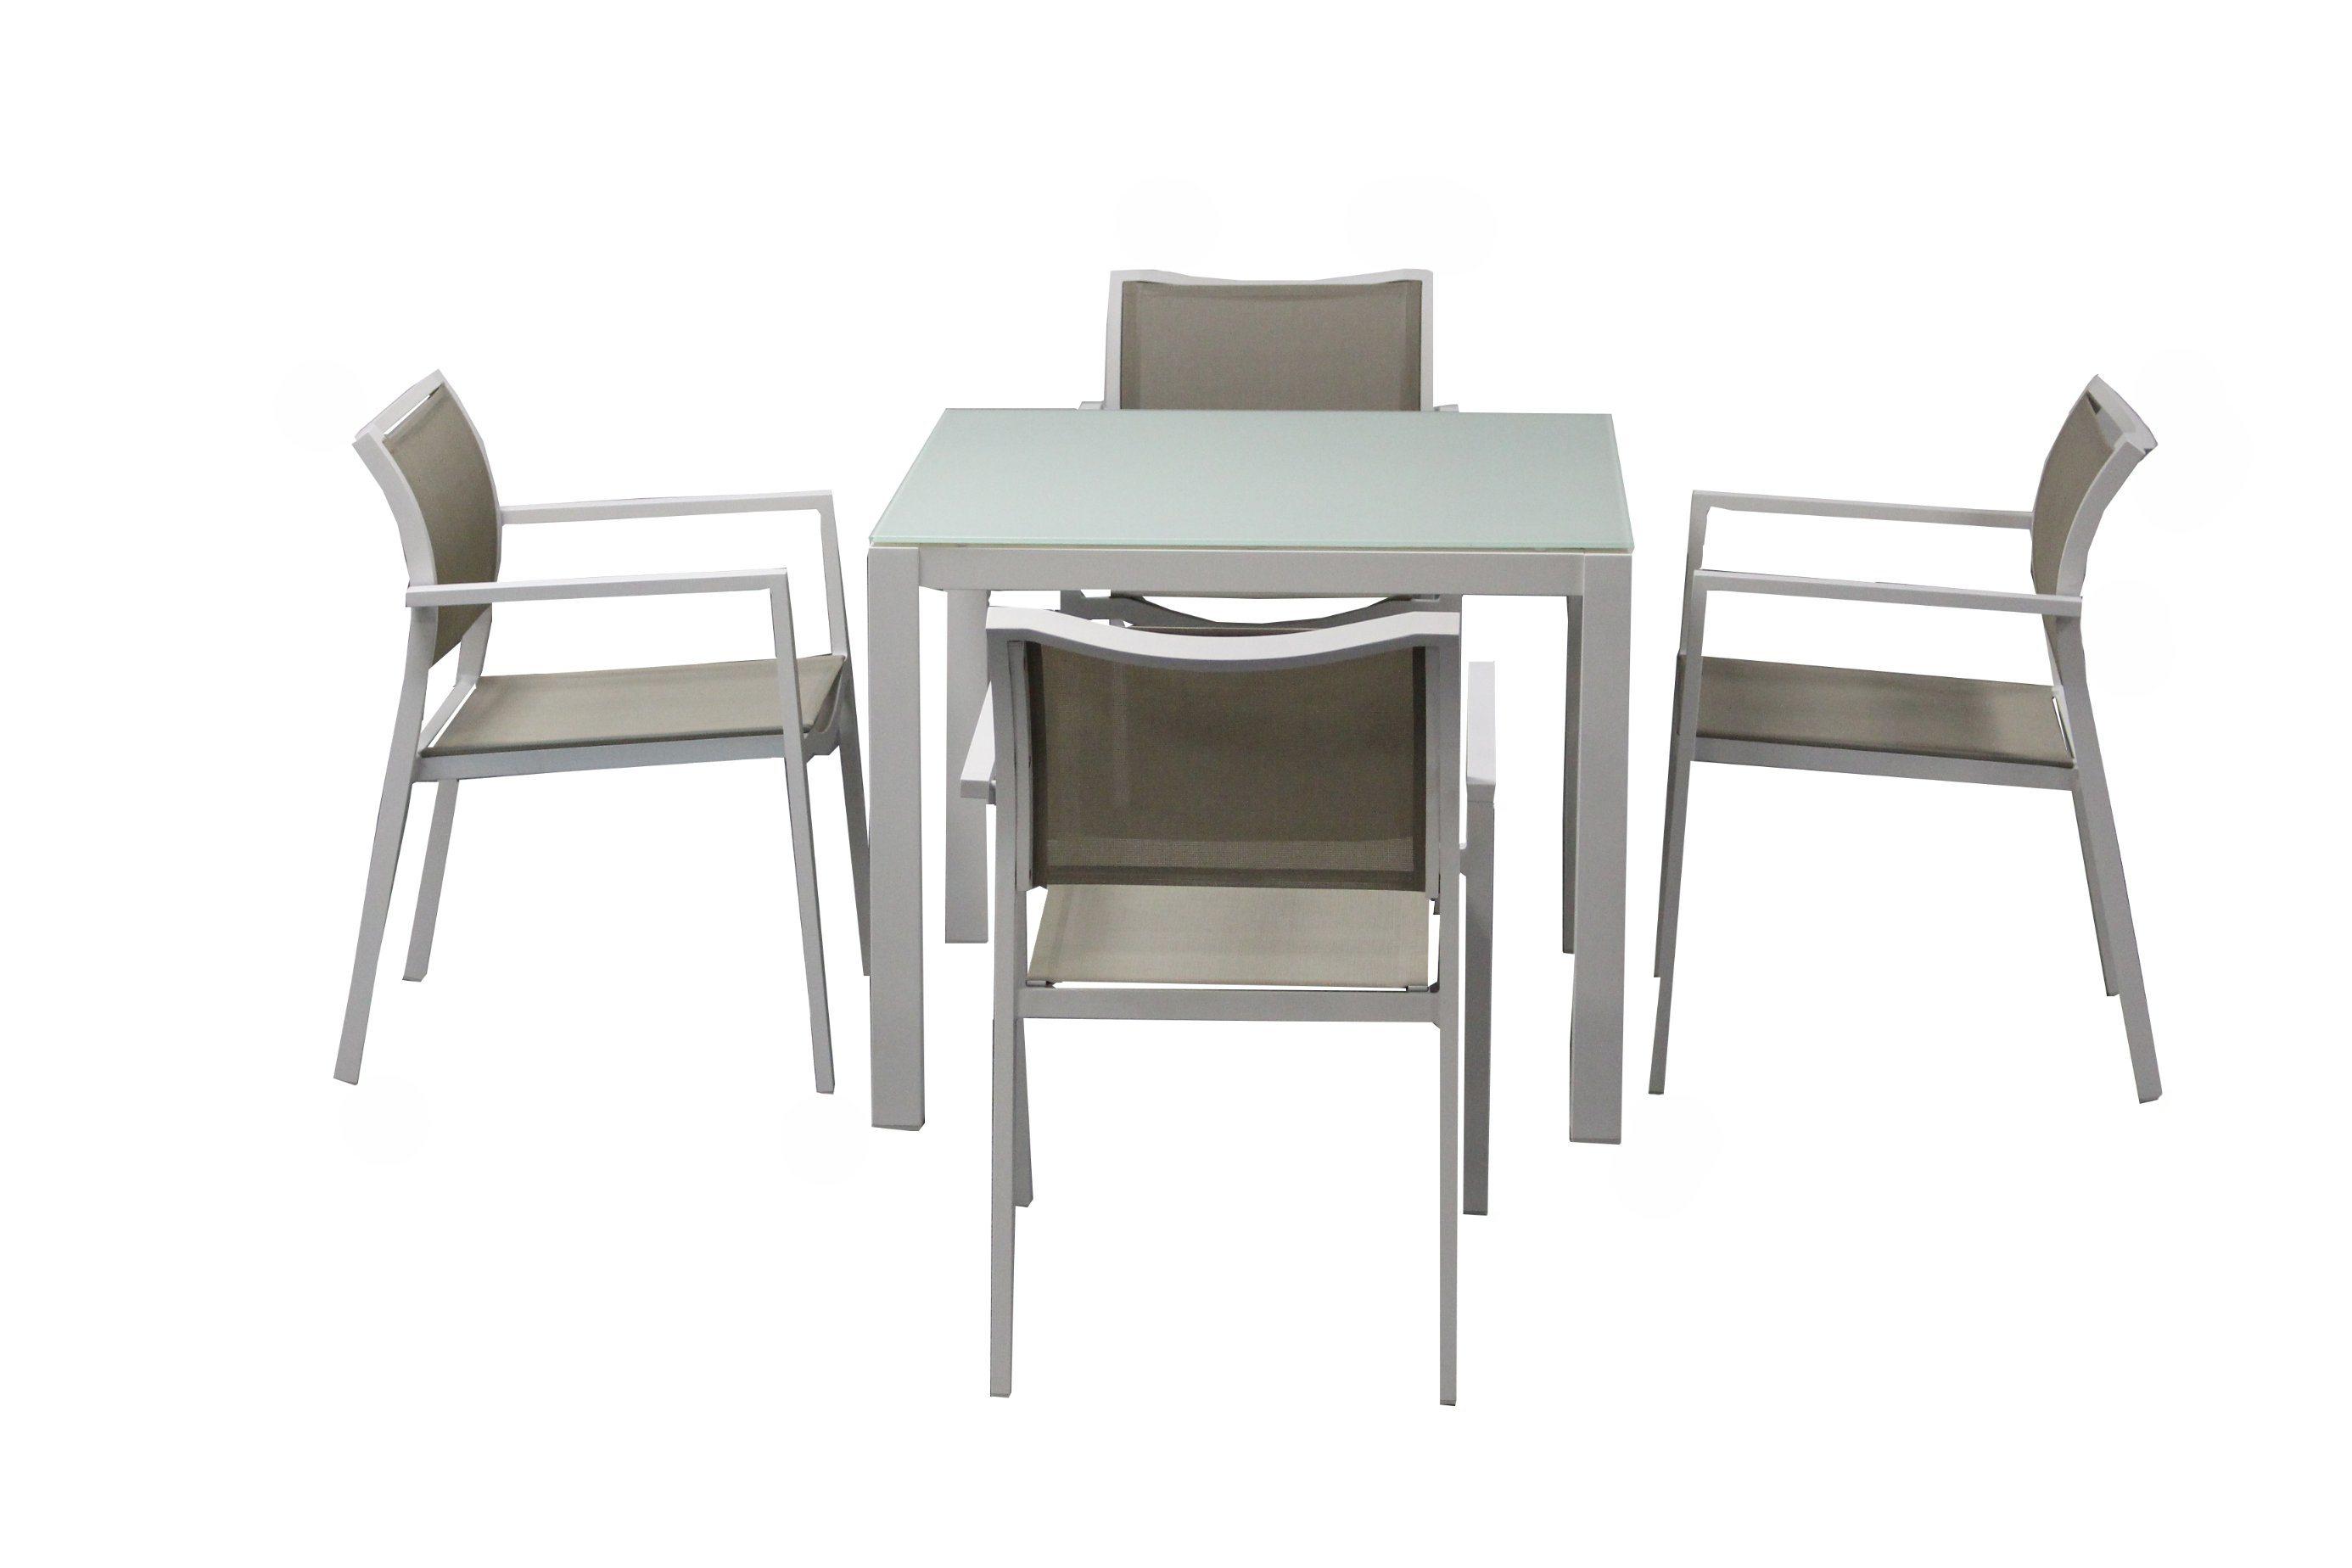 Powder Coating Aluminum Dining Set Textylene Outdoor Dining Set Batyline Chair